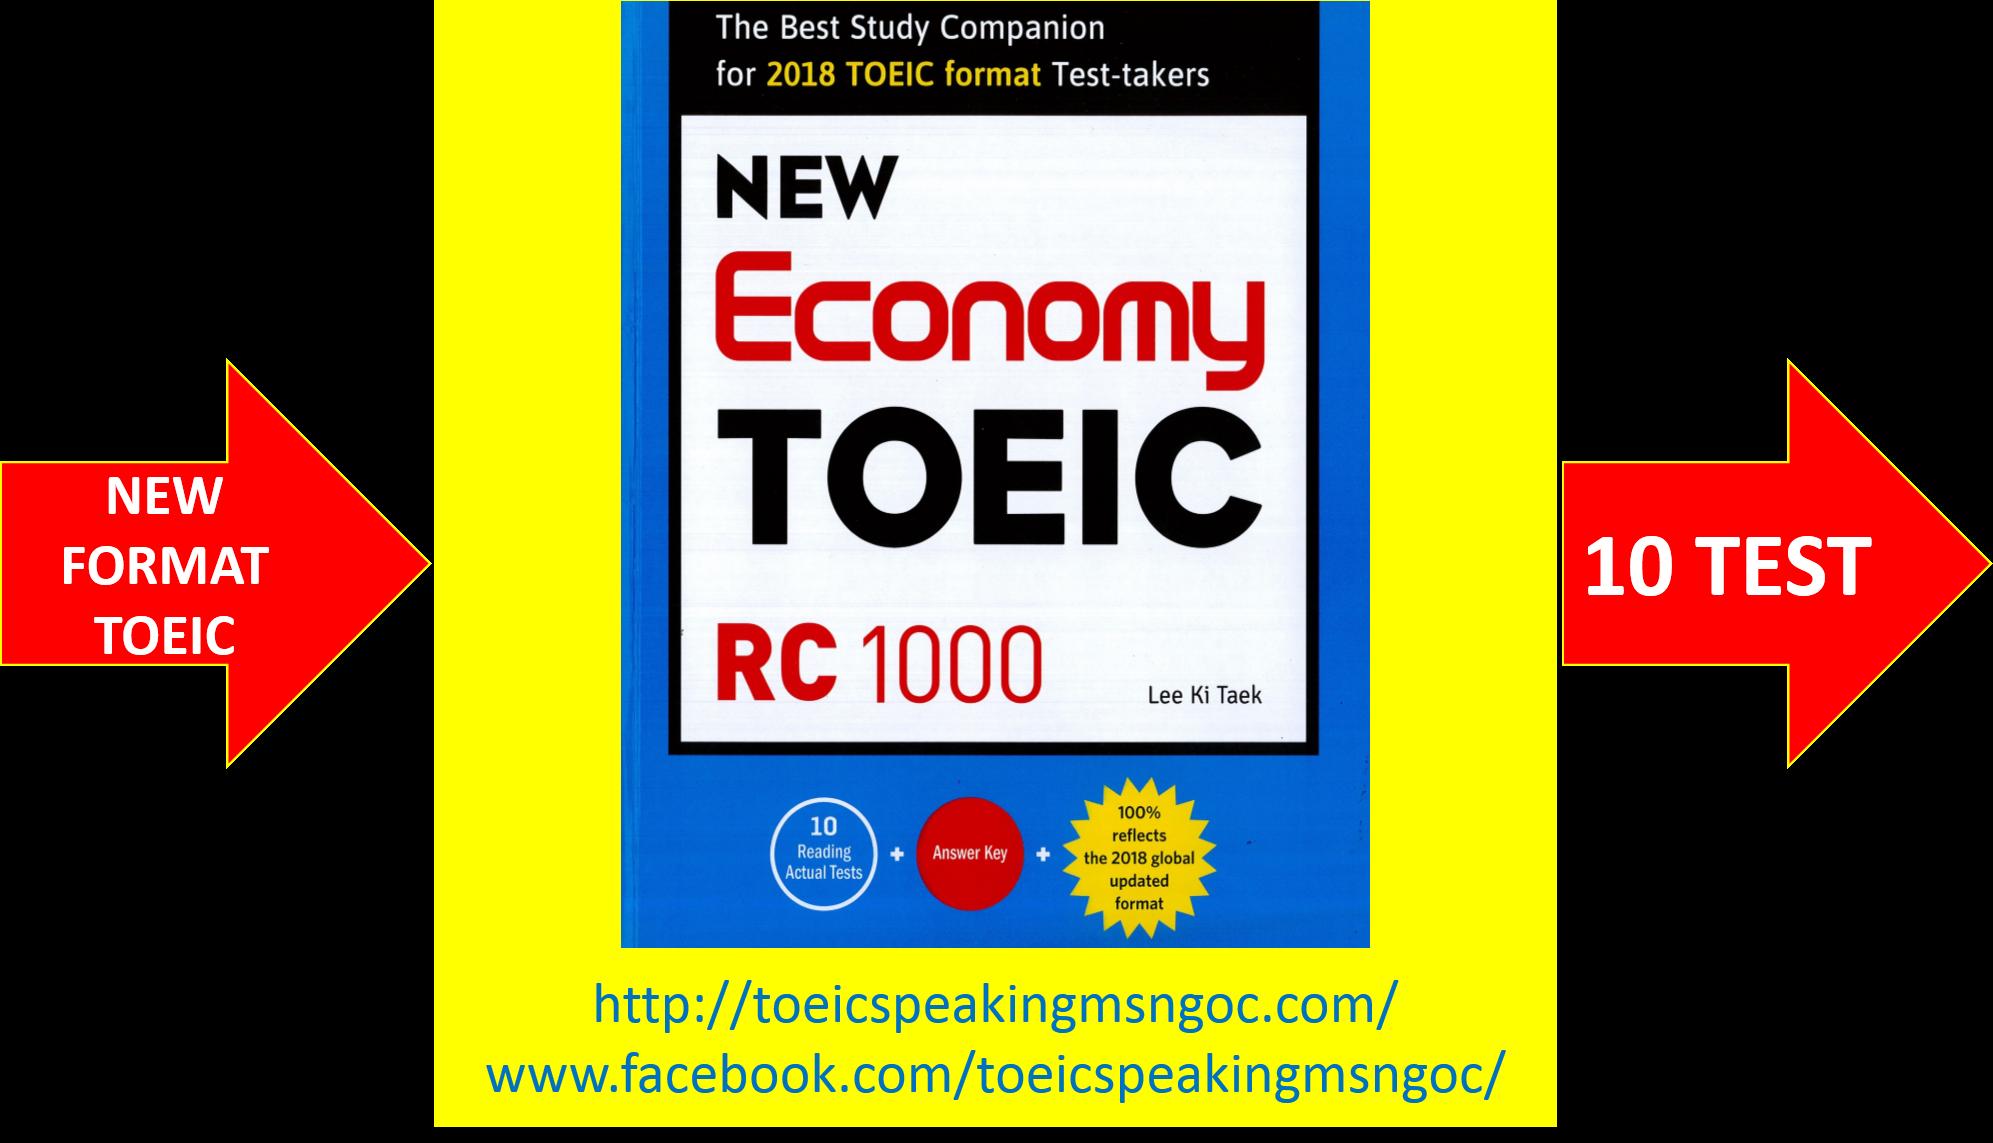 toeic-msngoc-thong-bao-cap-nhat-giao-trinh-toeic-cau-truc-moi-2019-71